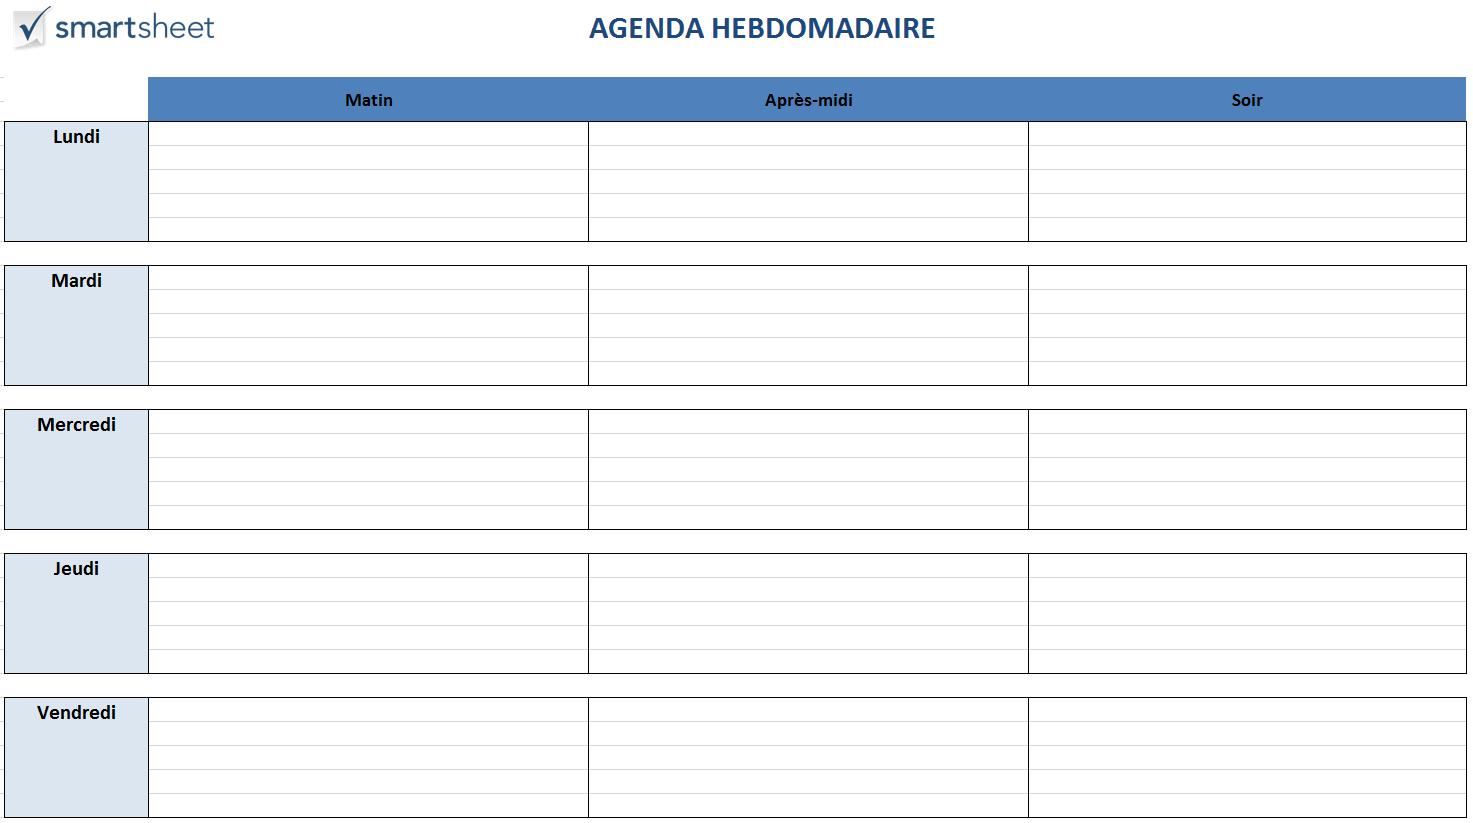 Exemple De Rapport De Travail Hebdomadaire Pdf | Weekly ...